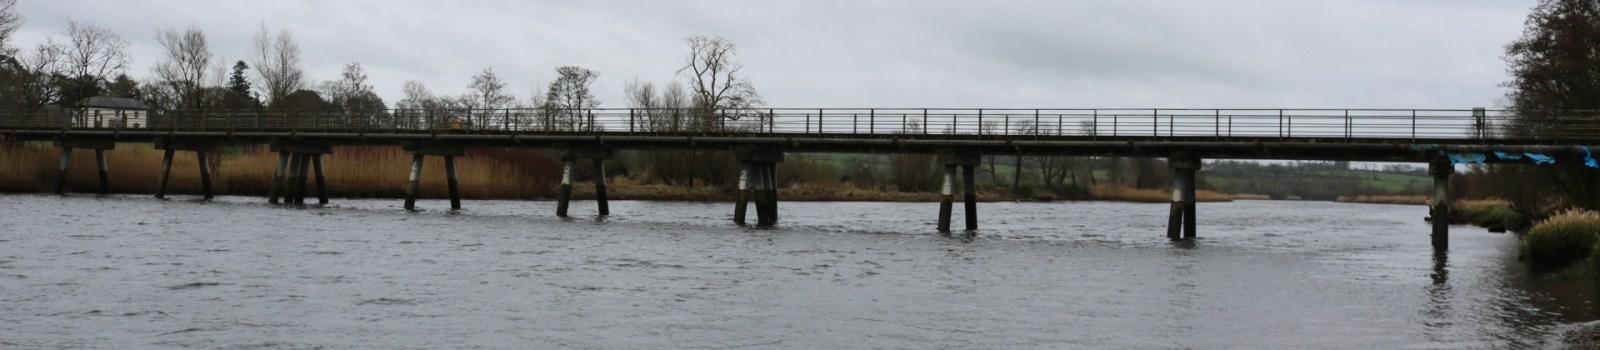 Slaney River, Edermine